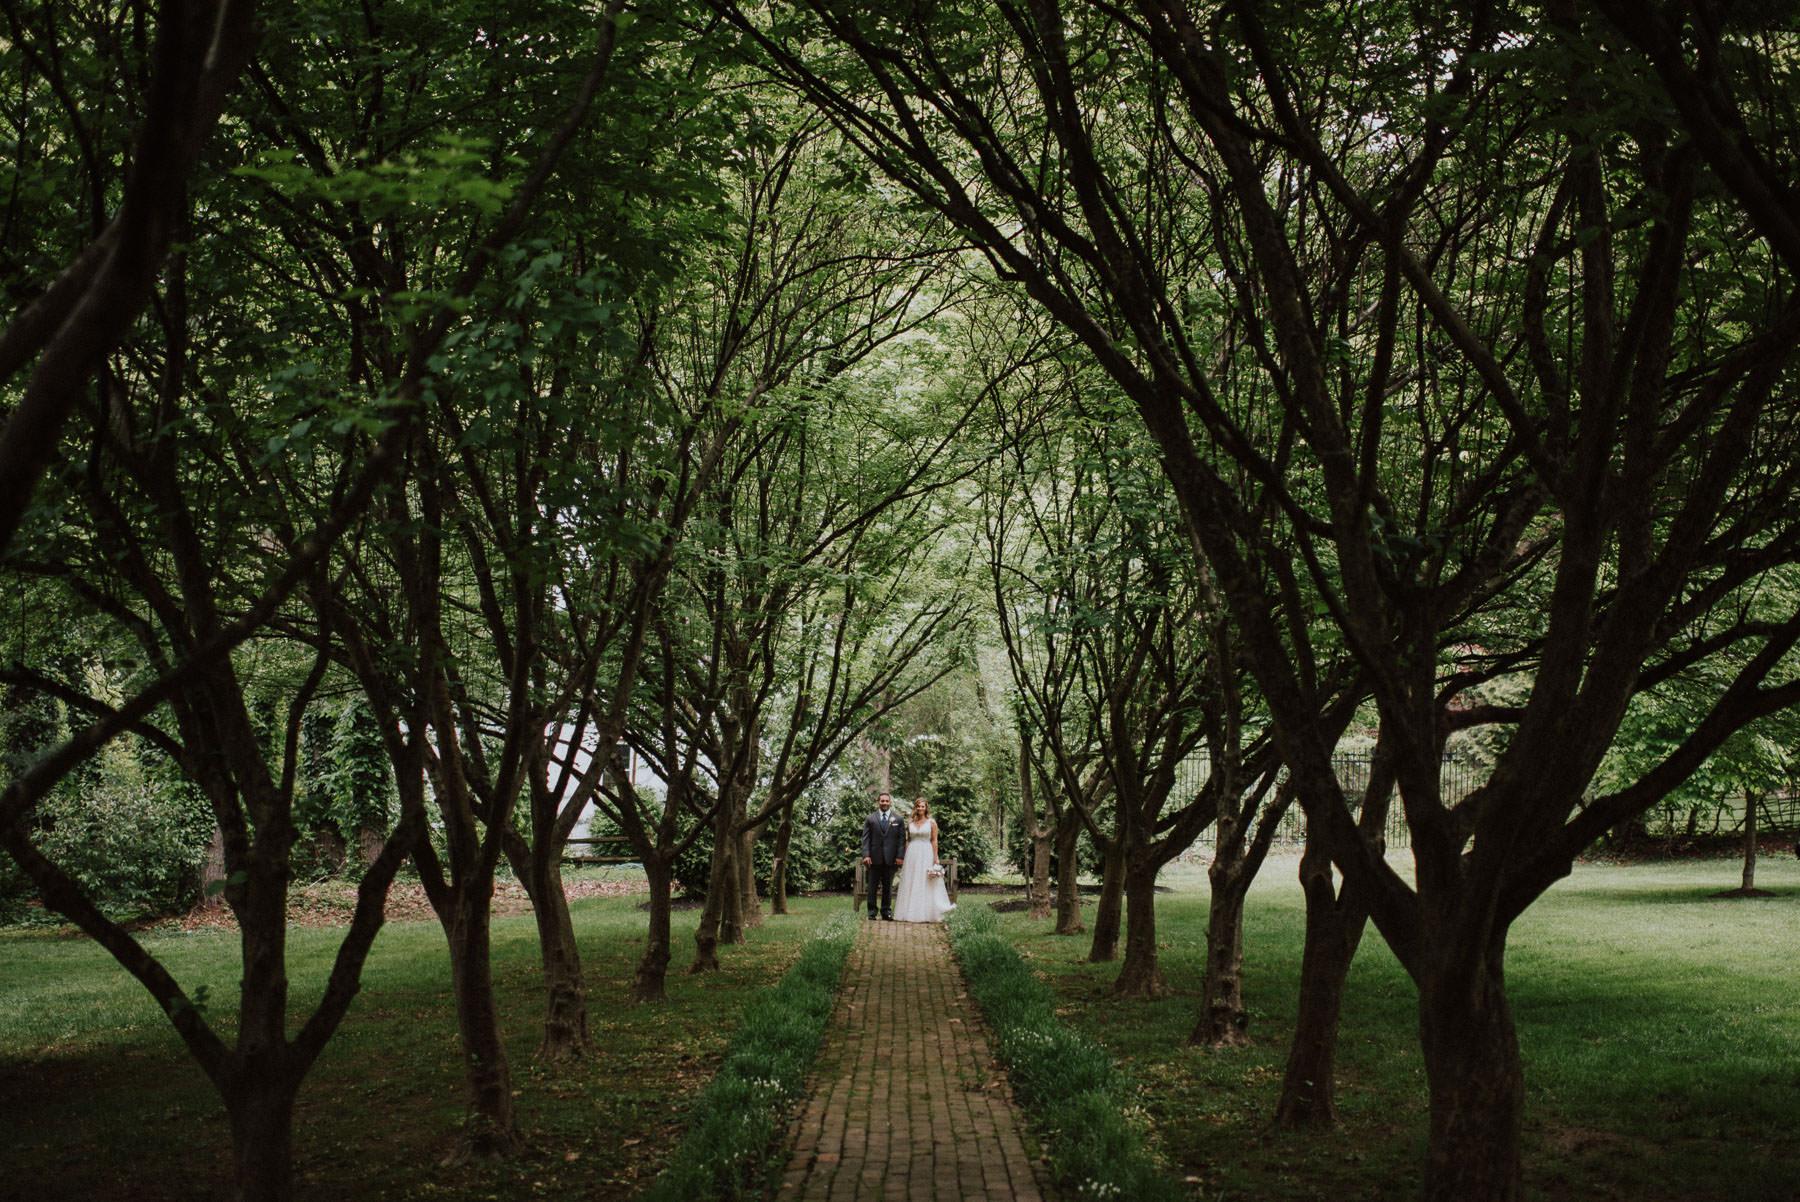 appleford-estate-wedding-photography-45.jpg